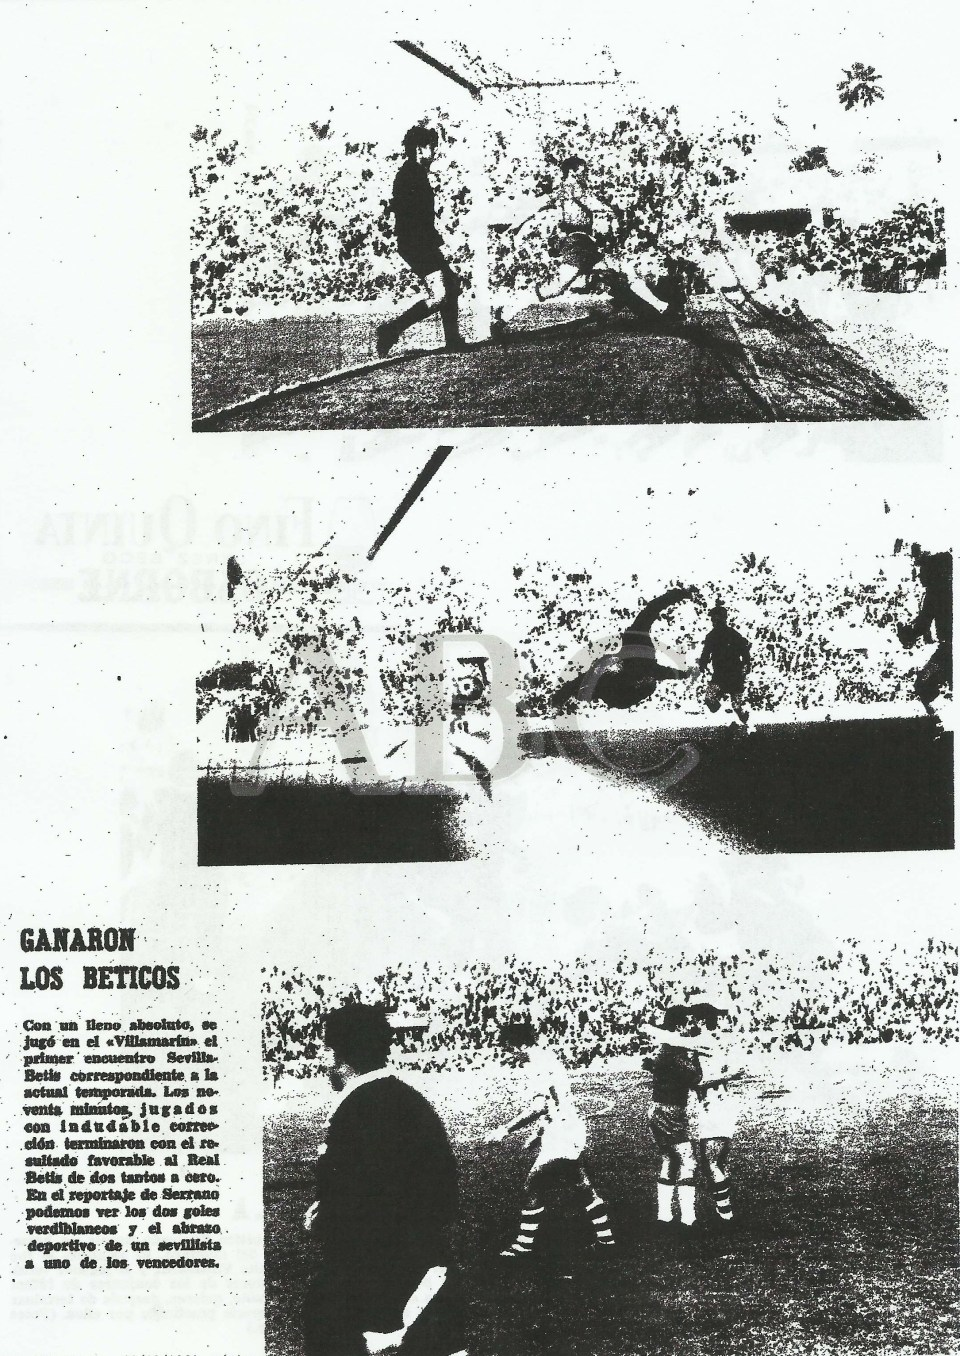 Fotos SERRANO ABC-SEVILLA-19641020Martes.